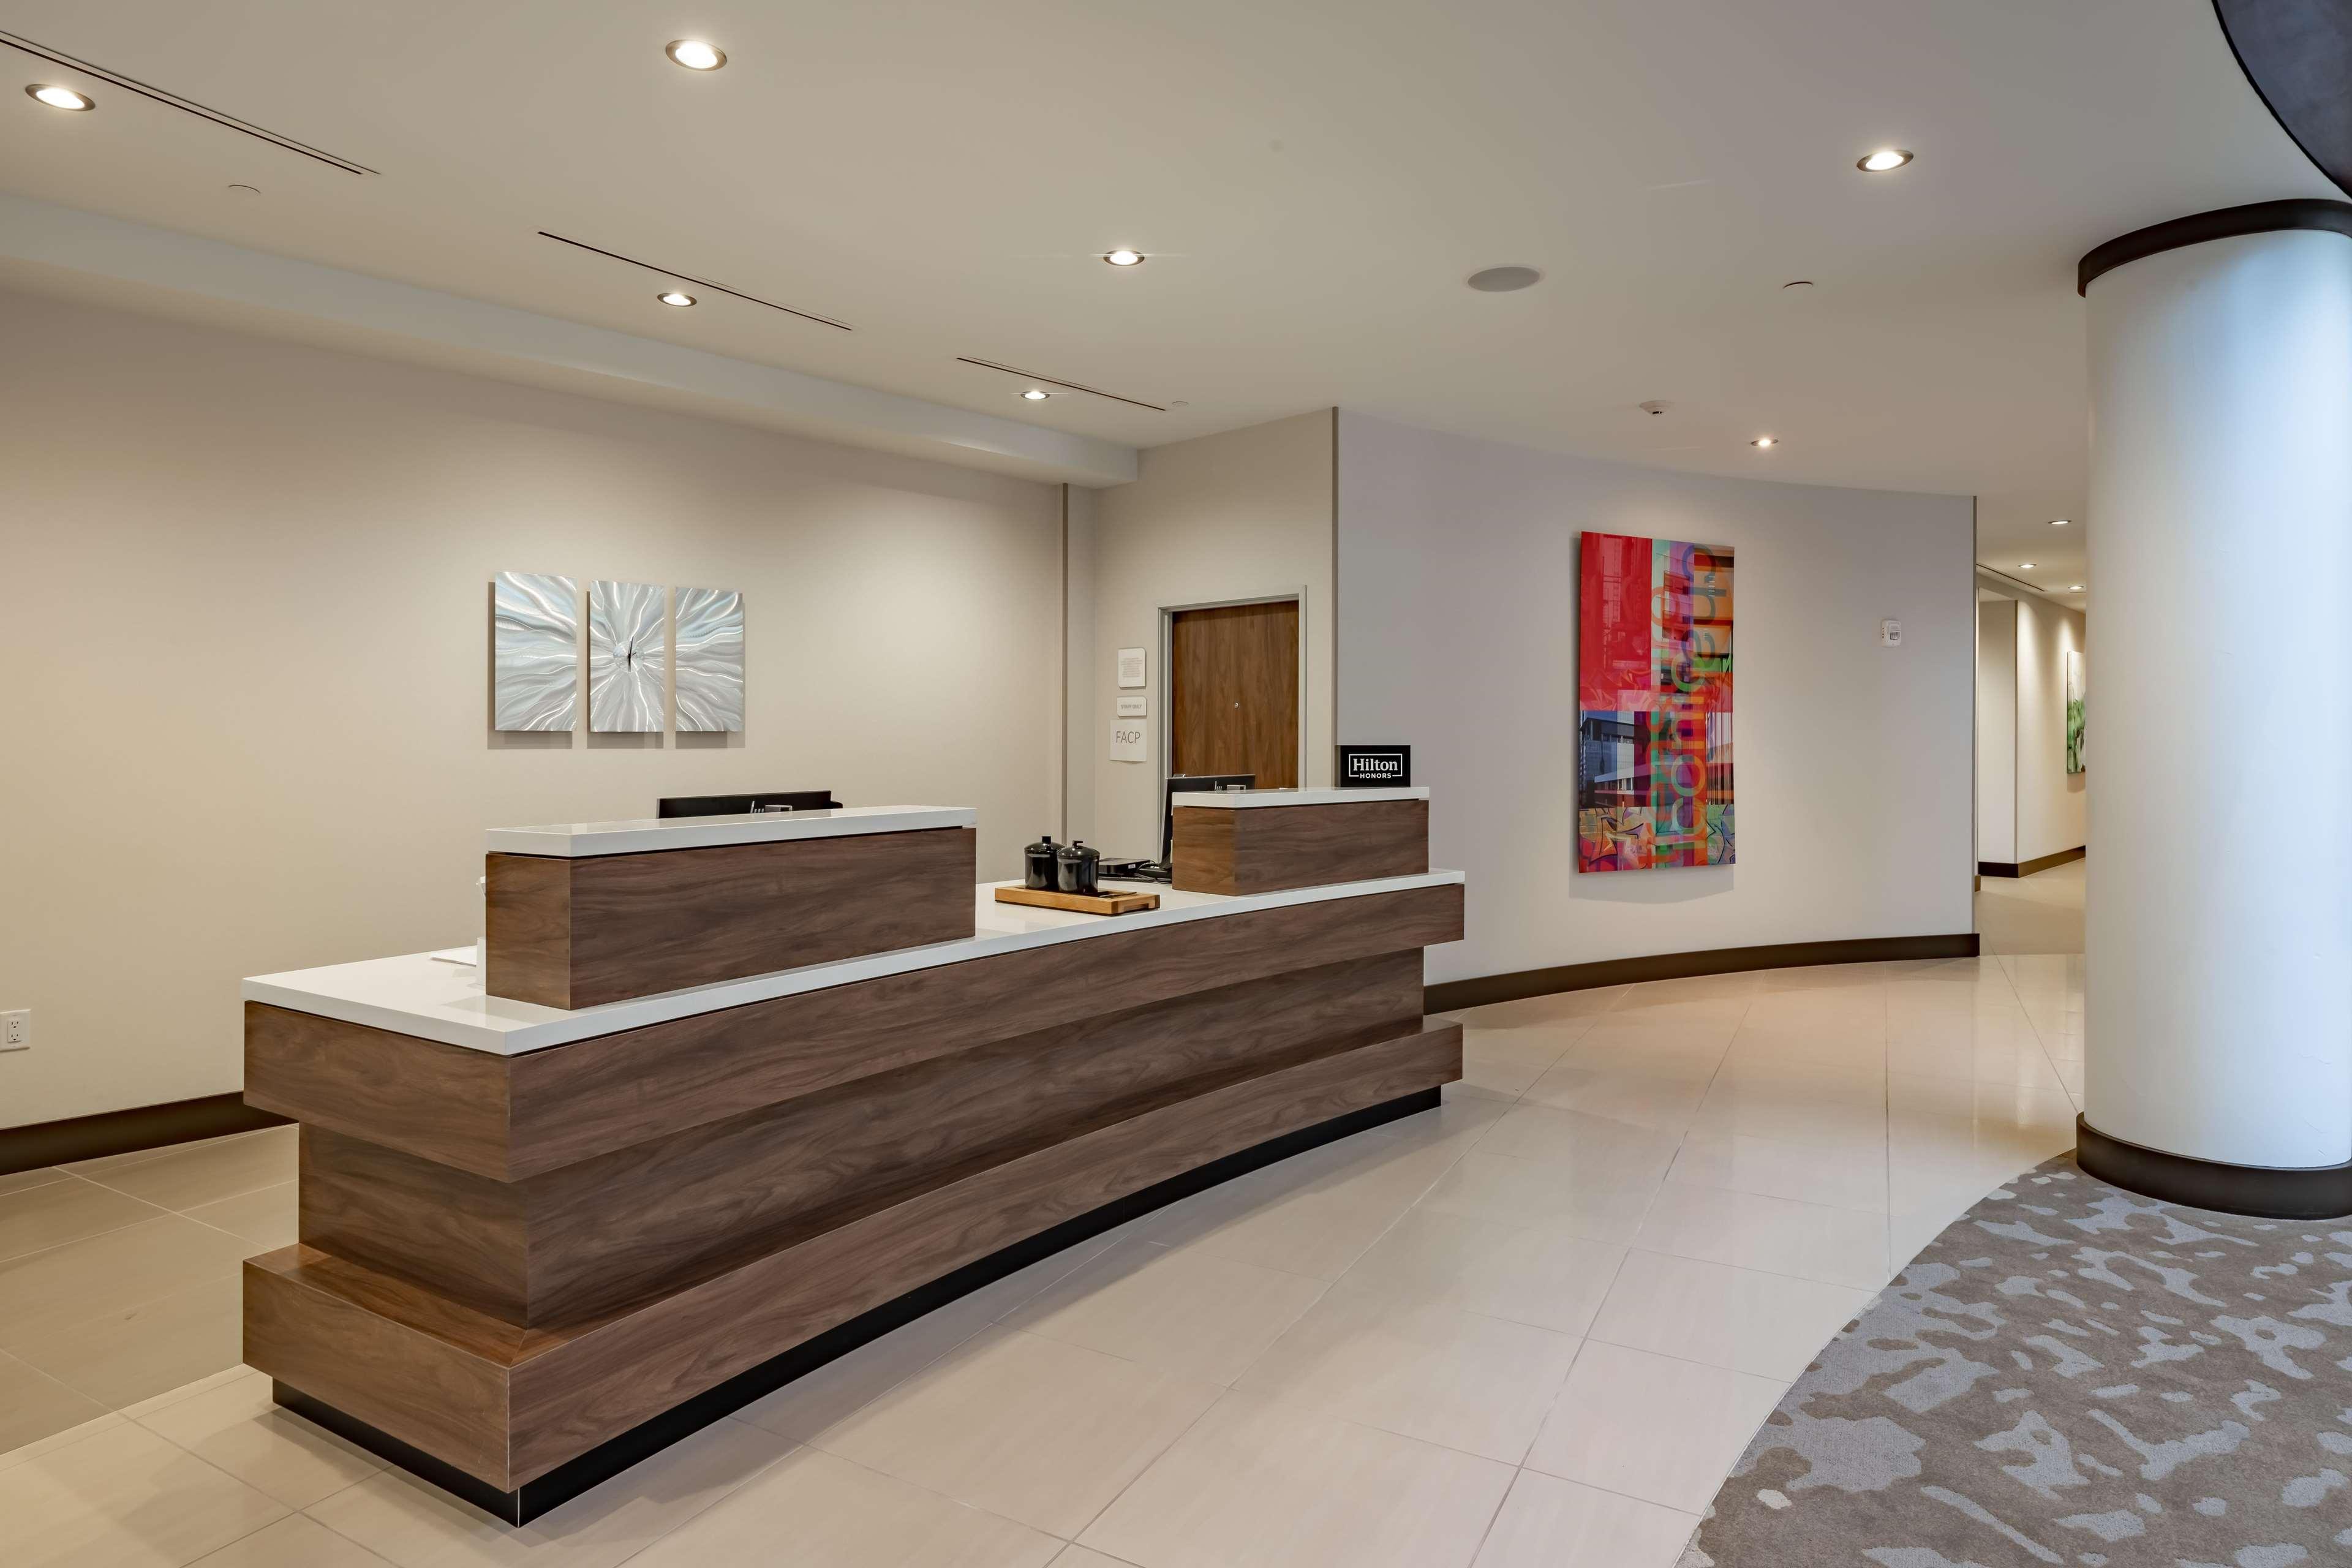 Hilton Garden Inn Dallas at Hurst Conference Center image 12